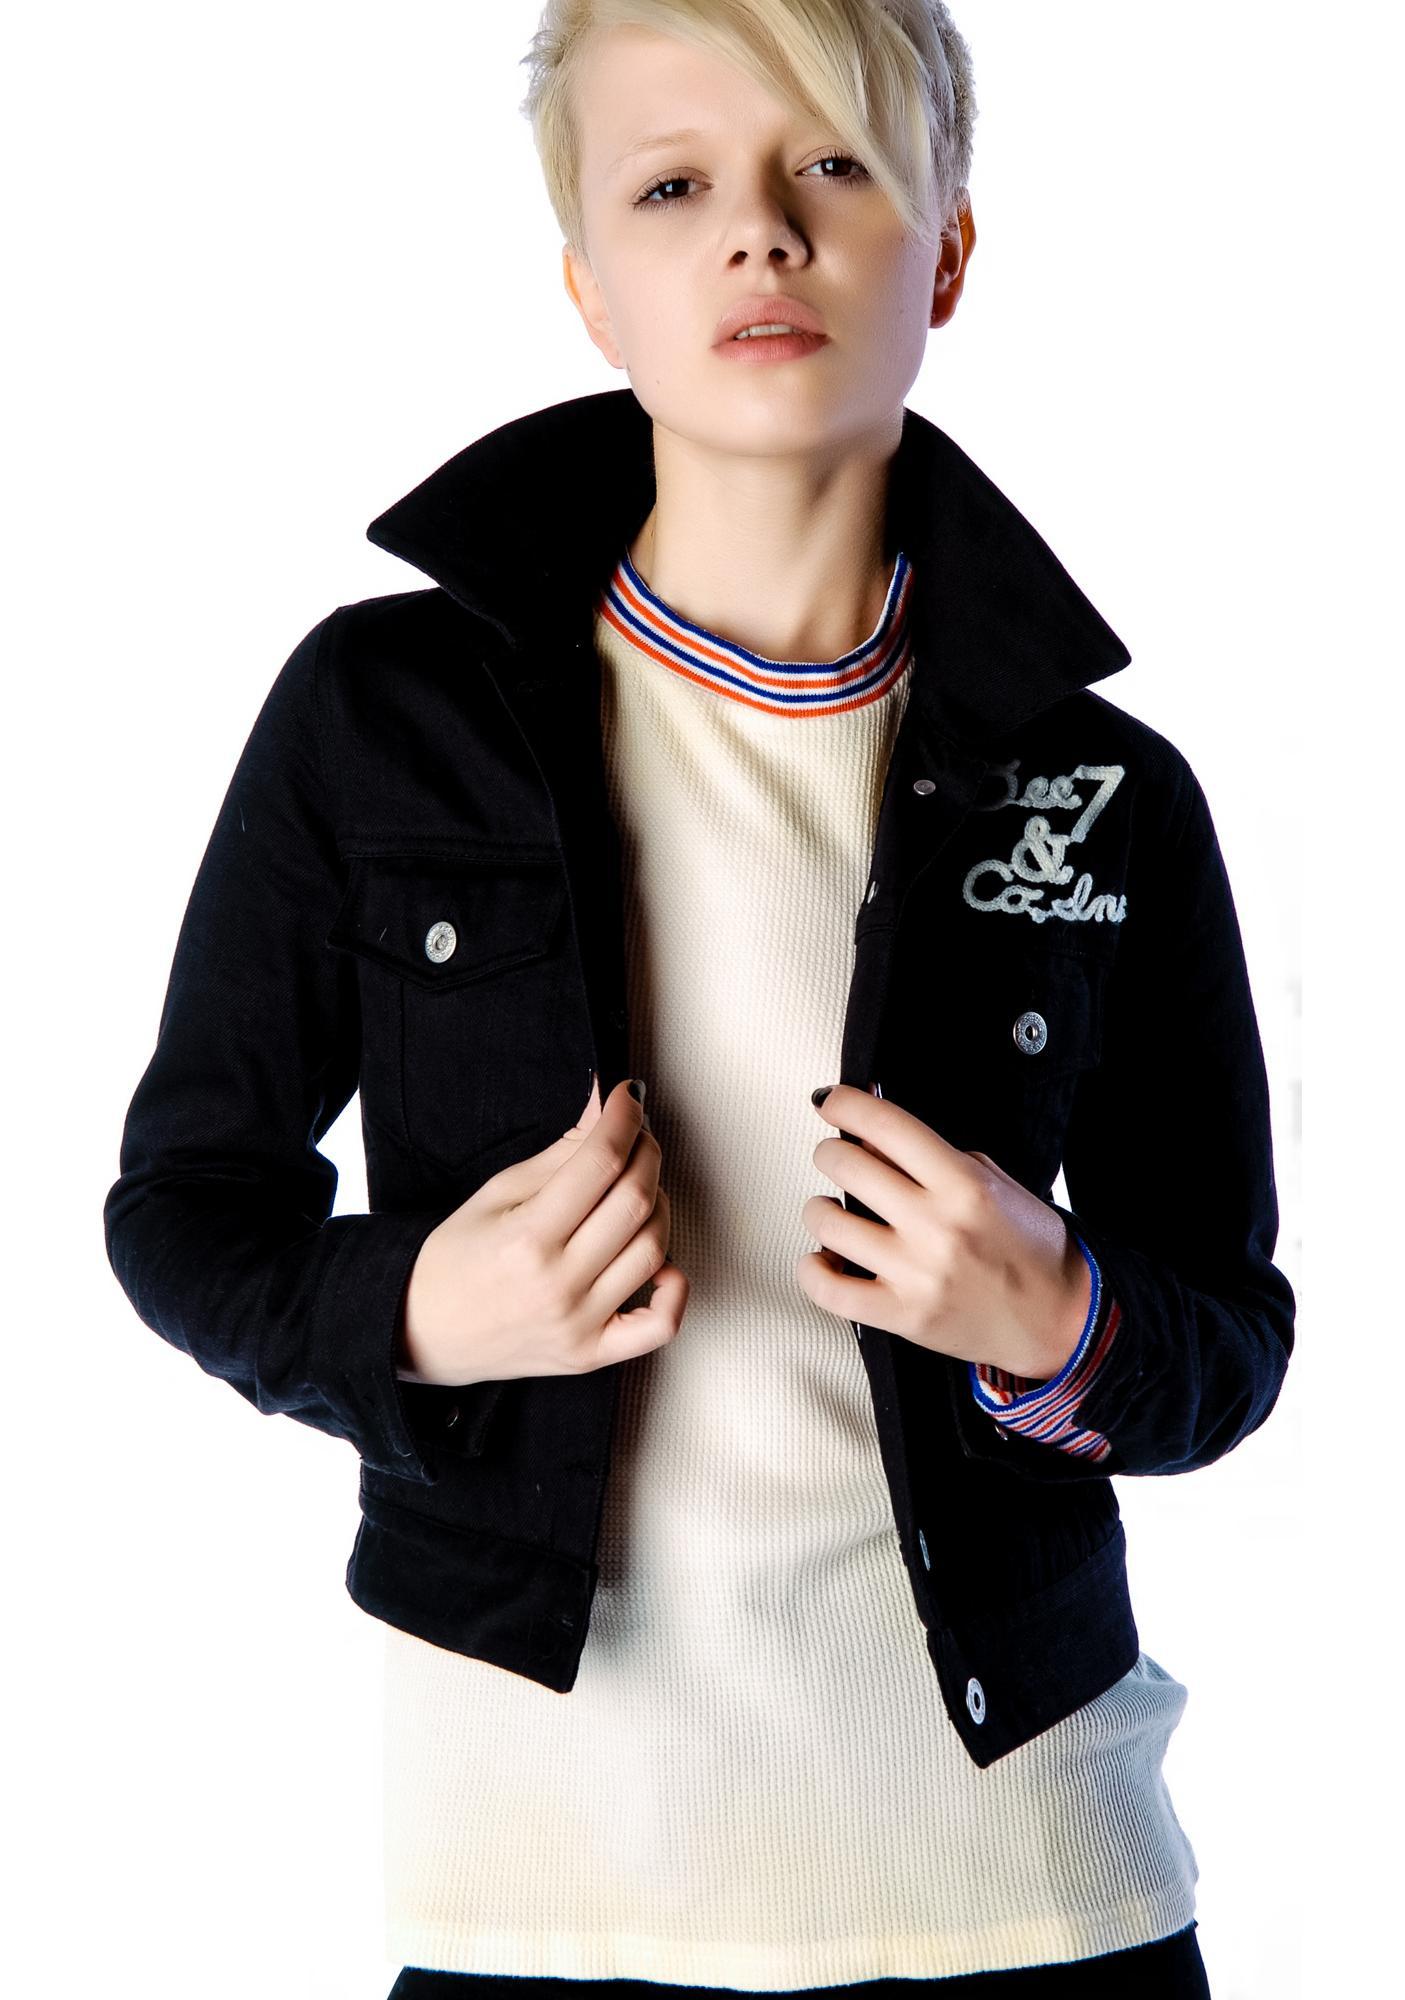 Halfman Romantics LV Needle Jacket